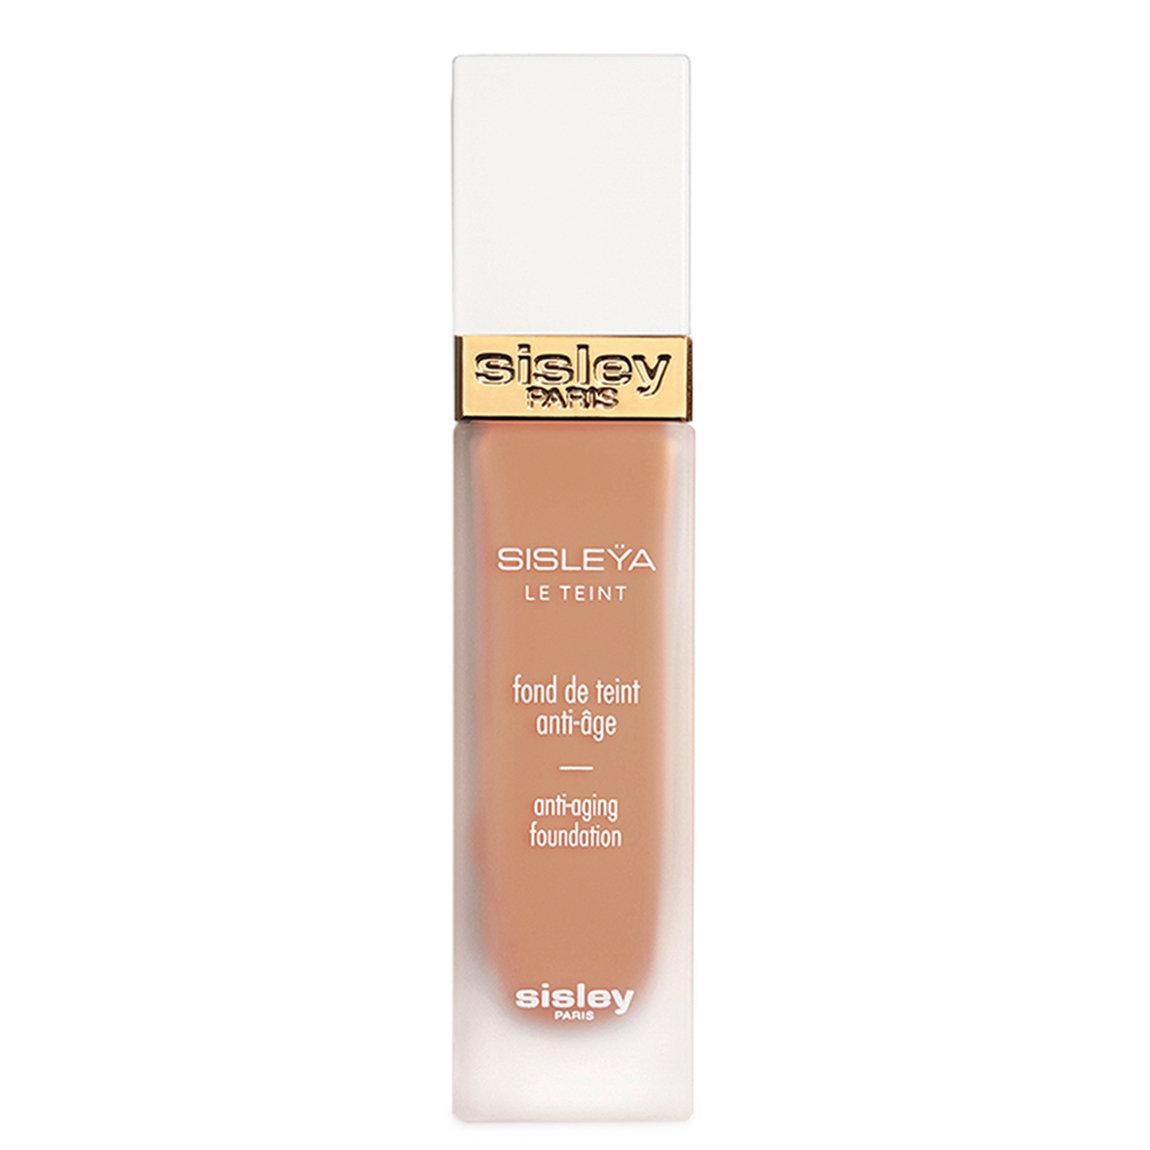 Sisley-Paris Sisleÿa Le Teint 4R Spice